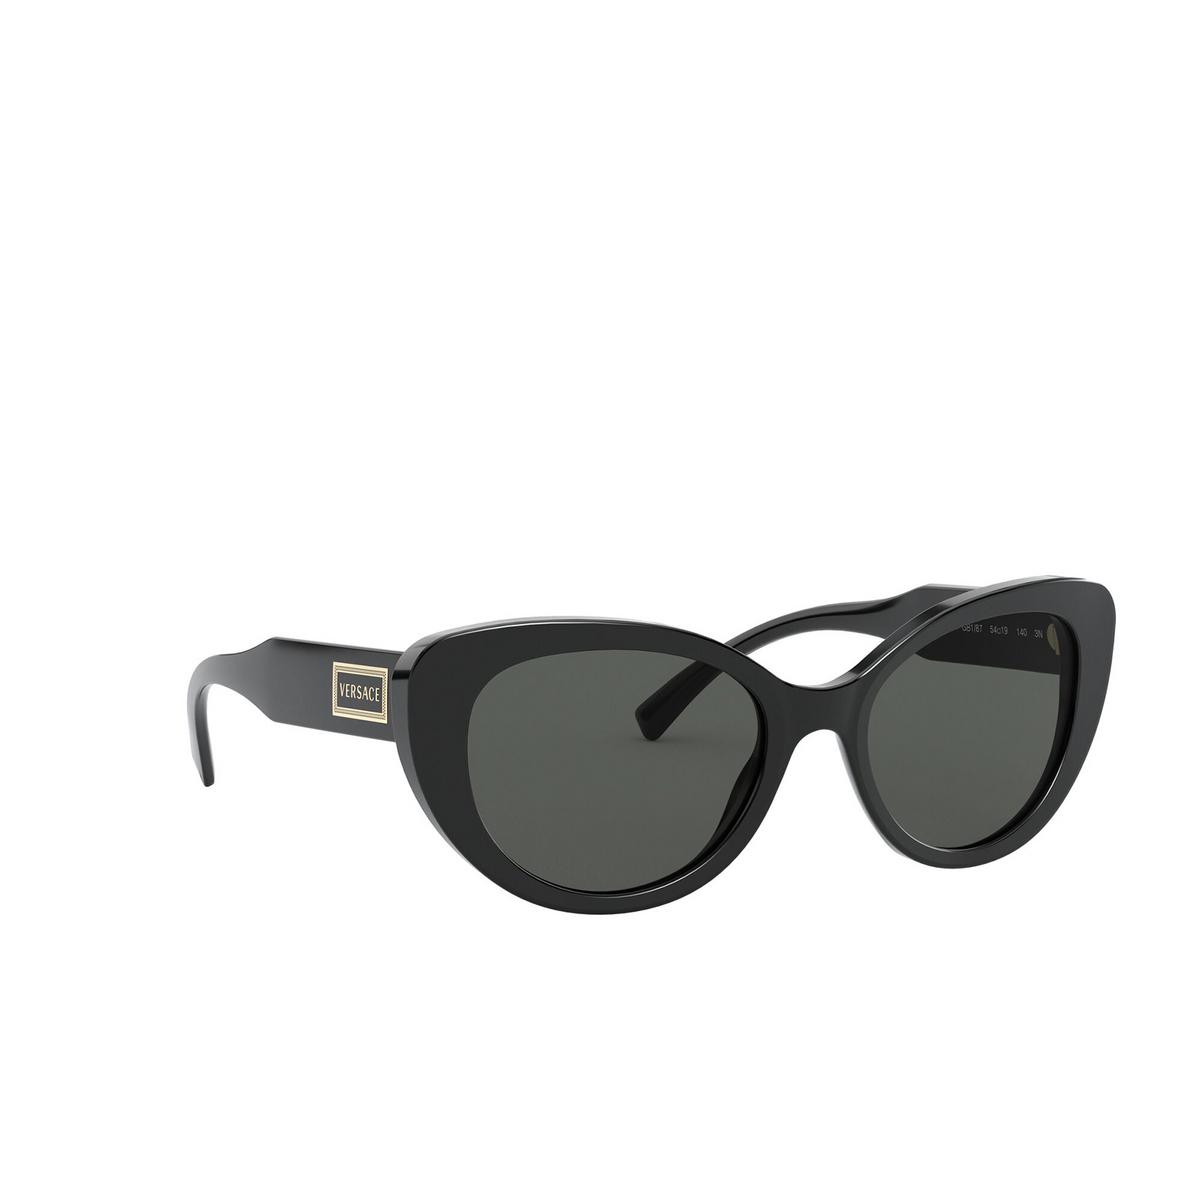 Versace® Cat-eye Sunglasses: VE4378 color Black GB1/87 - three-quarters view.